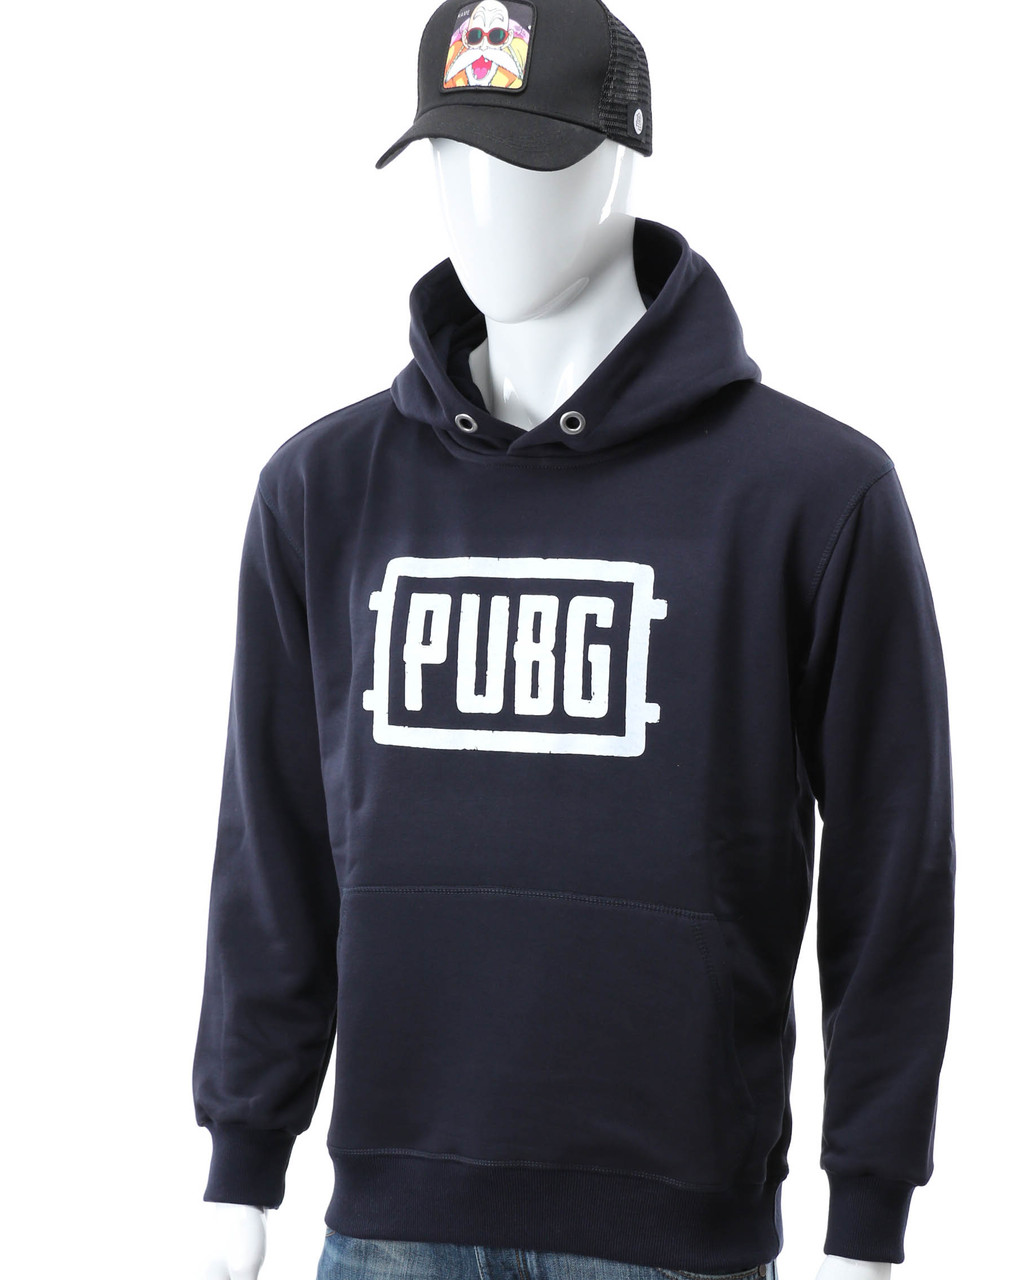 "Худи т синий HOPE с принтом ""PUBG"" Т-2 DBLU M(Р) 20-581-201"